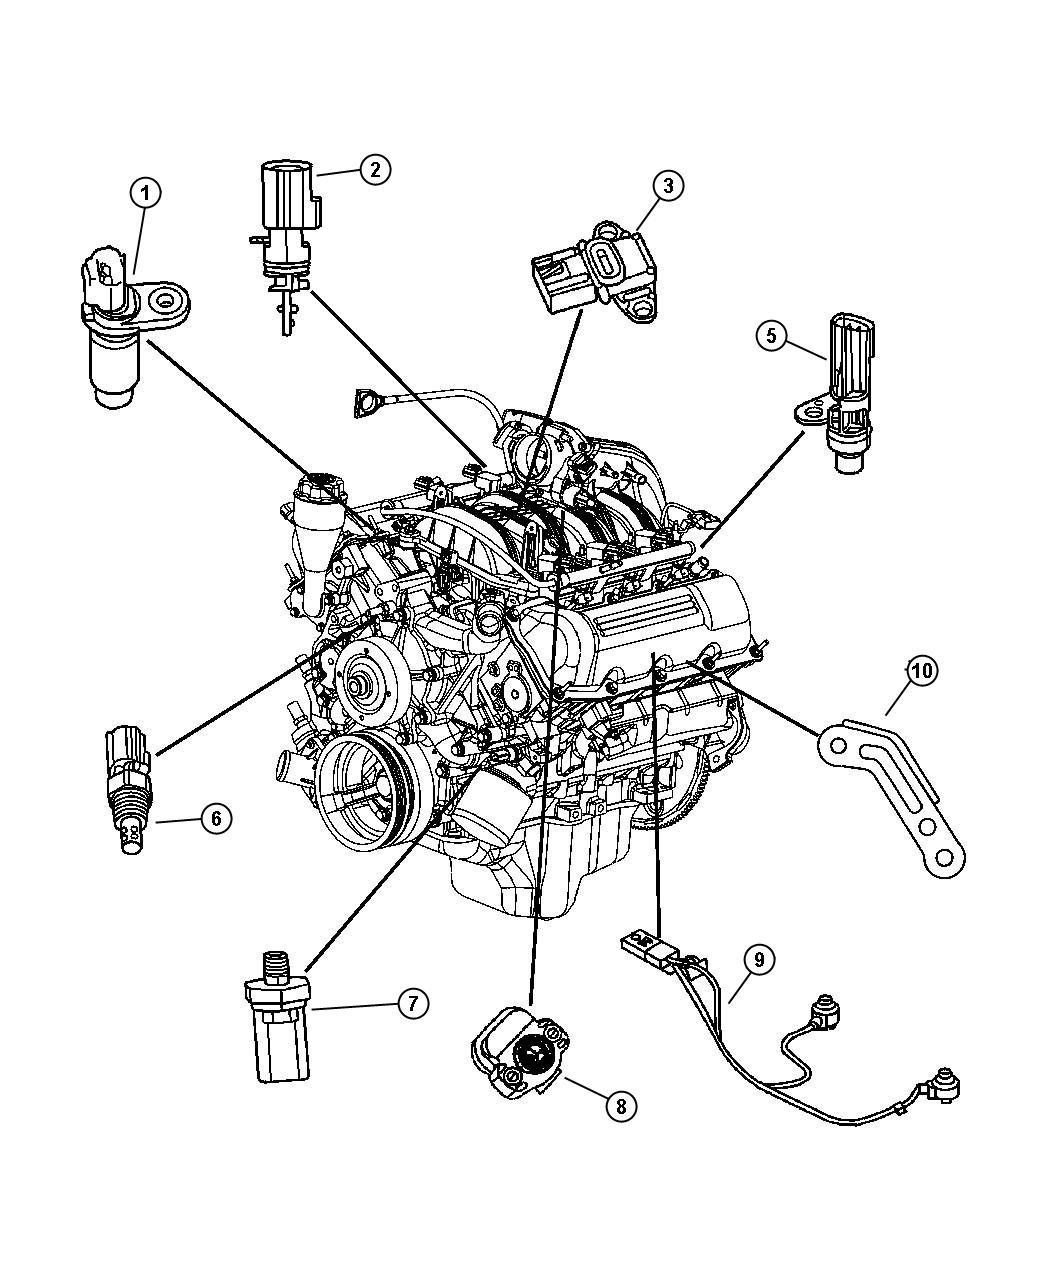 2004 dodge durango engine diagram 1988 honda civic stereo wiring get free image about